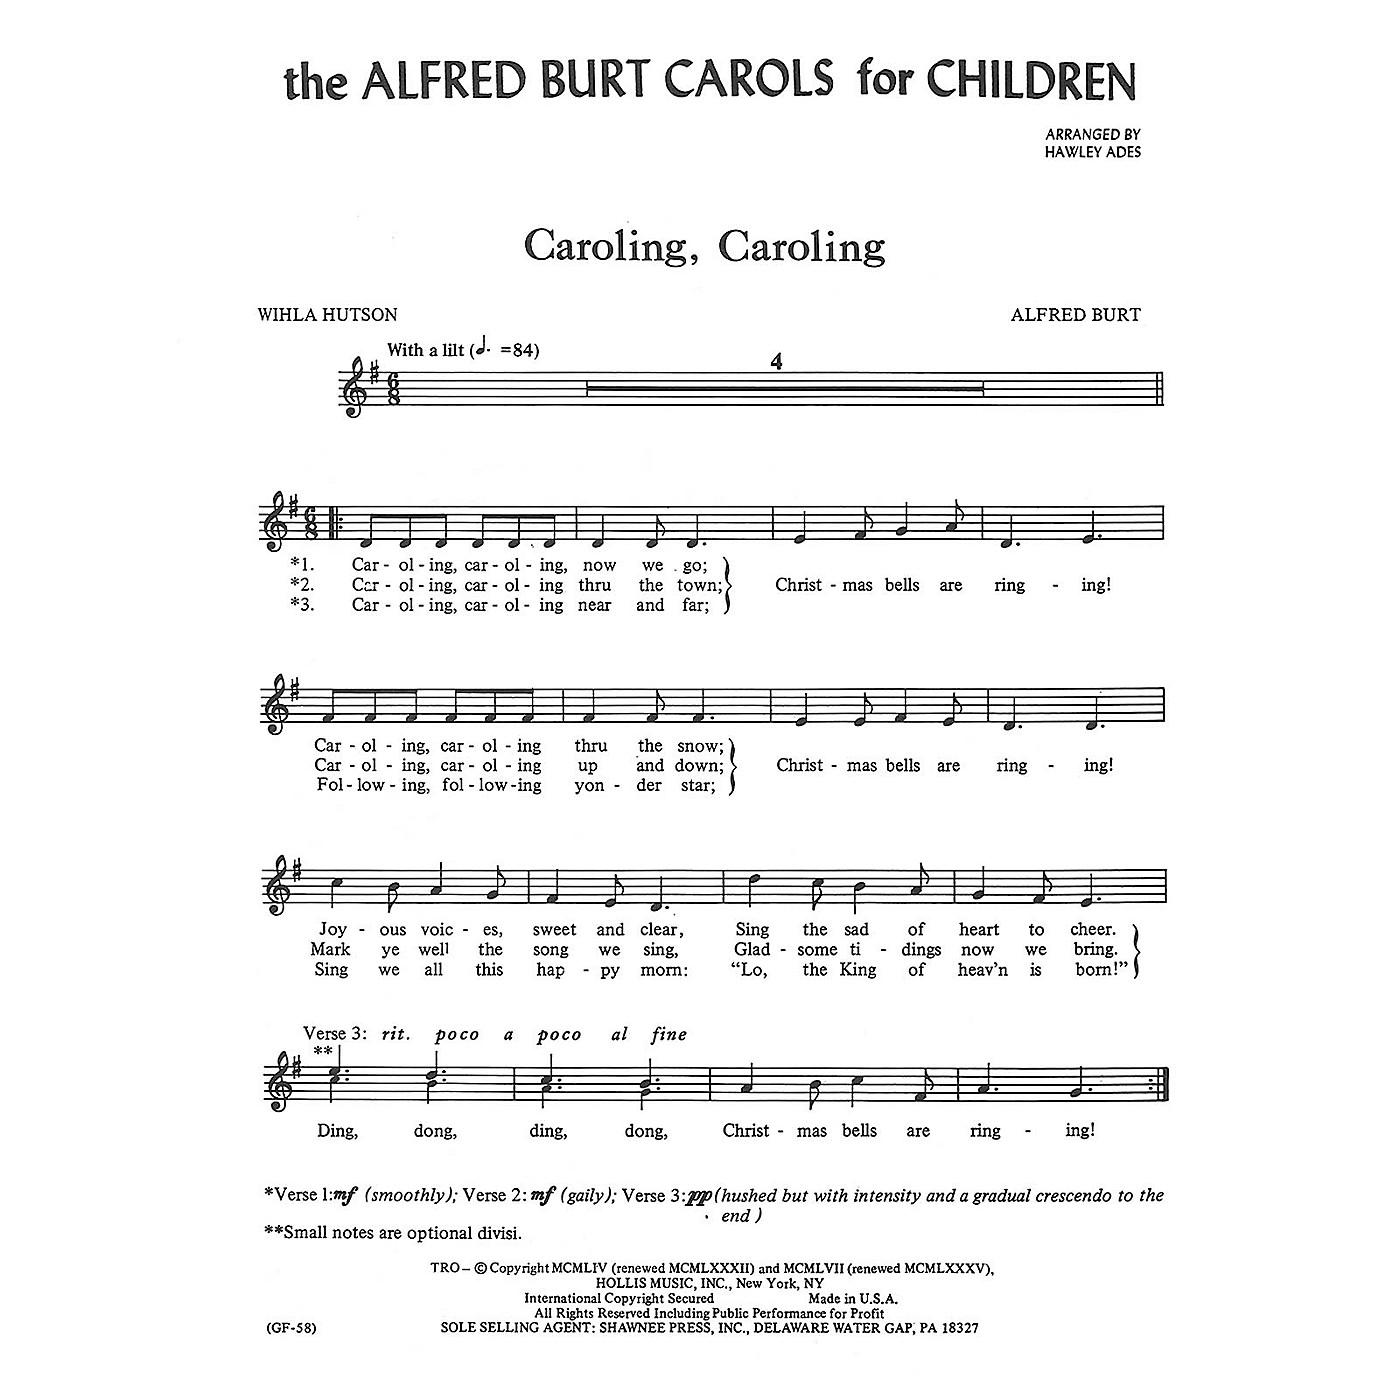 Shawnee Press The Alfred Burt Carols for Children UNIS arranged by Hawley Ades thumbnail